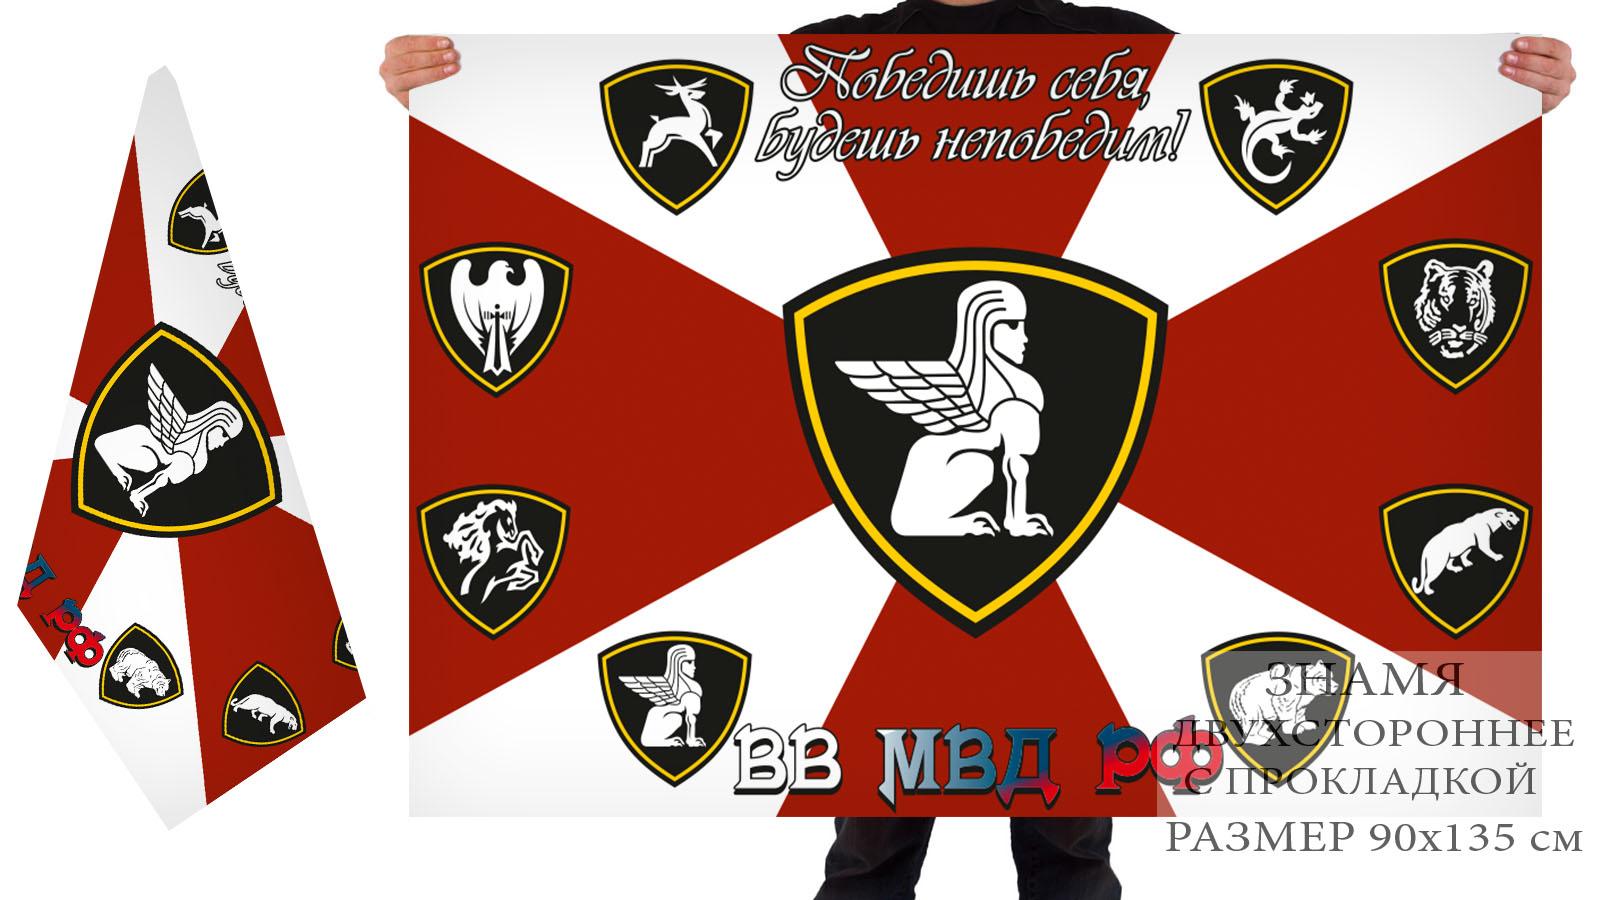 Двусторонний флаг ВВ МВД РФ с эмблемами округов